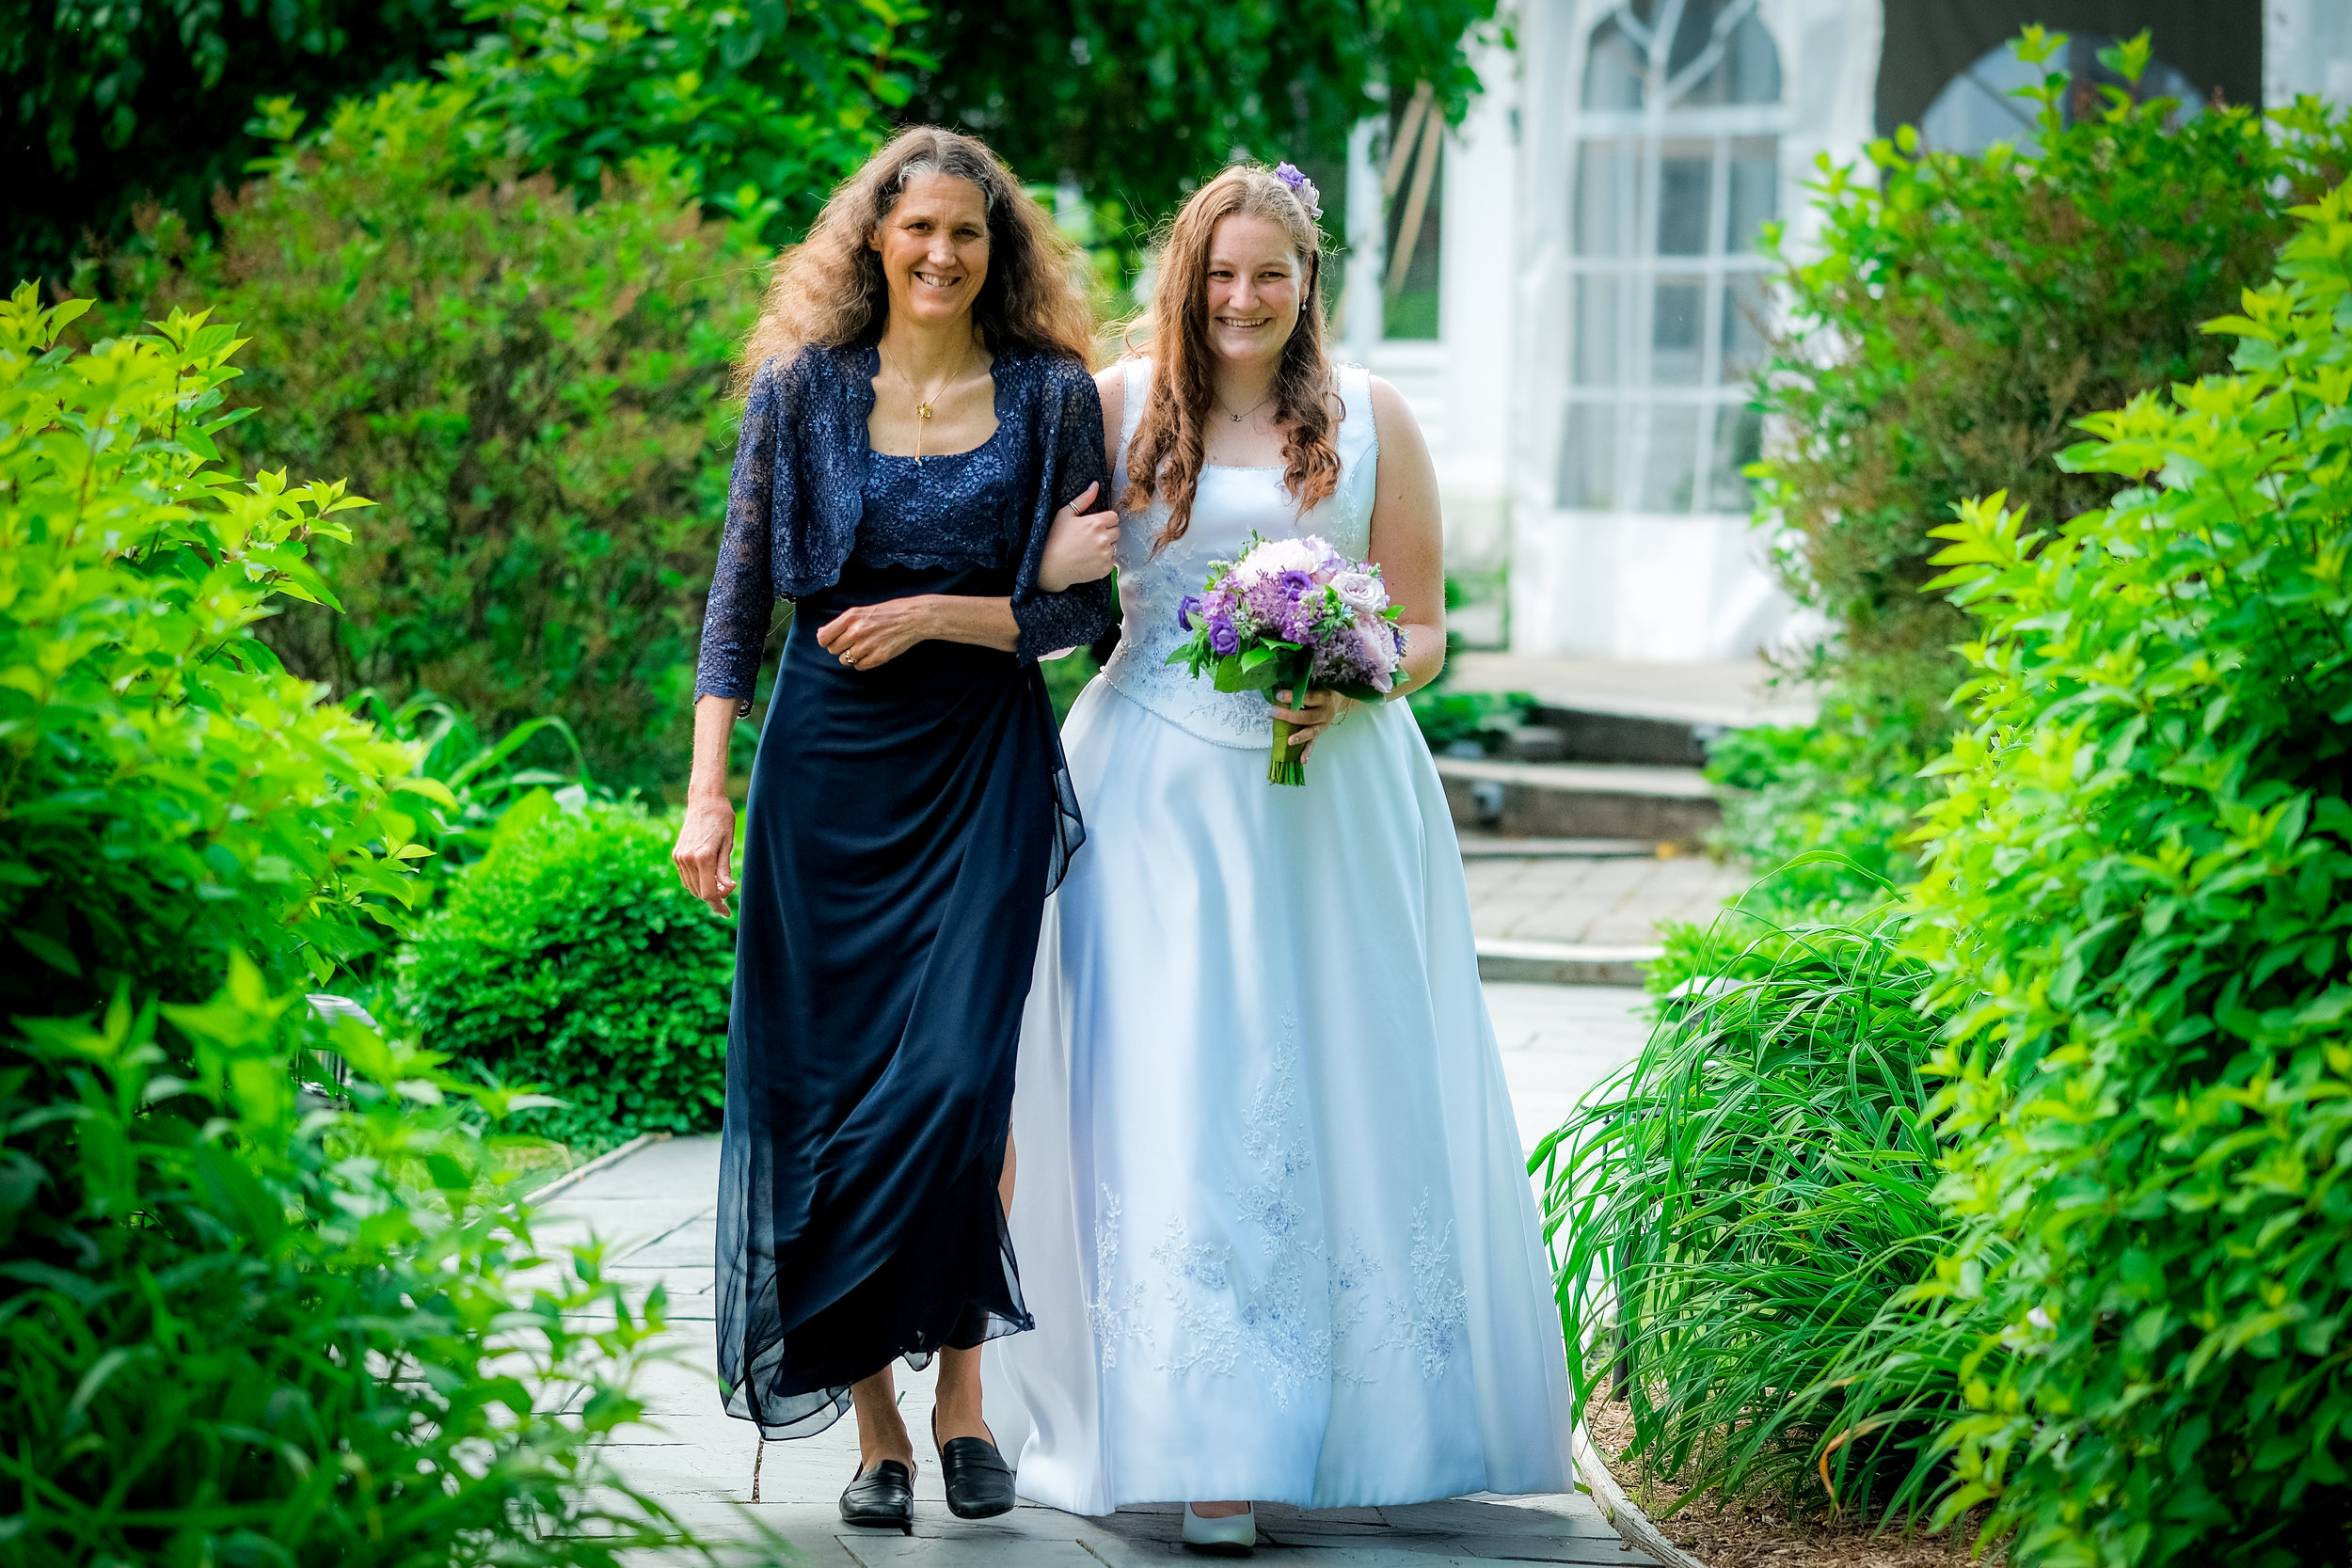 Vermont-Lilac-Inn-Wedding-Photography-546.jpg